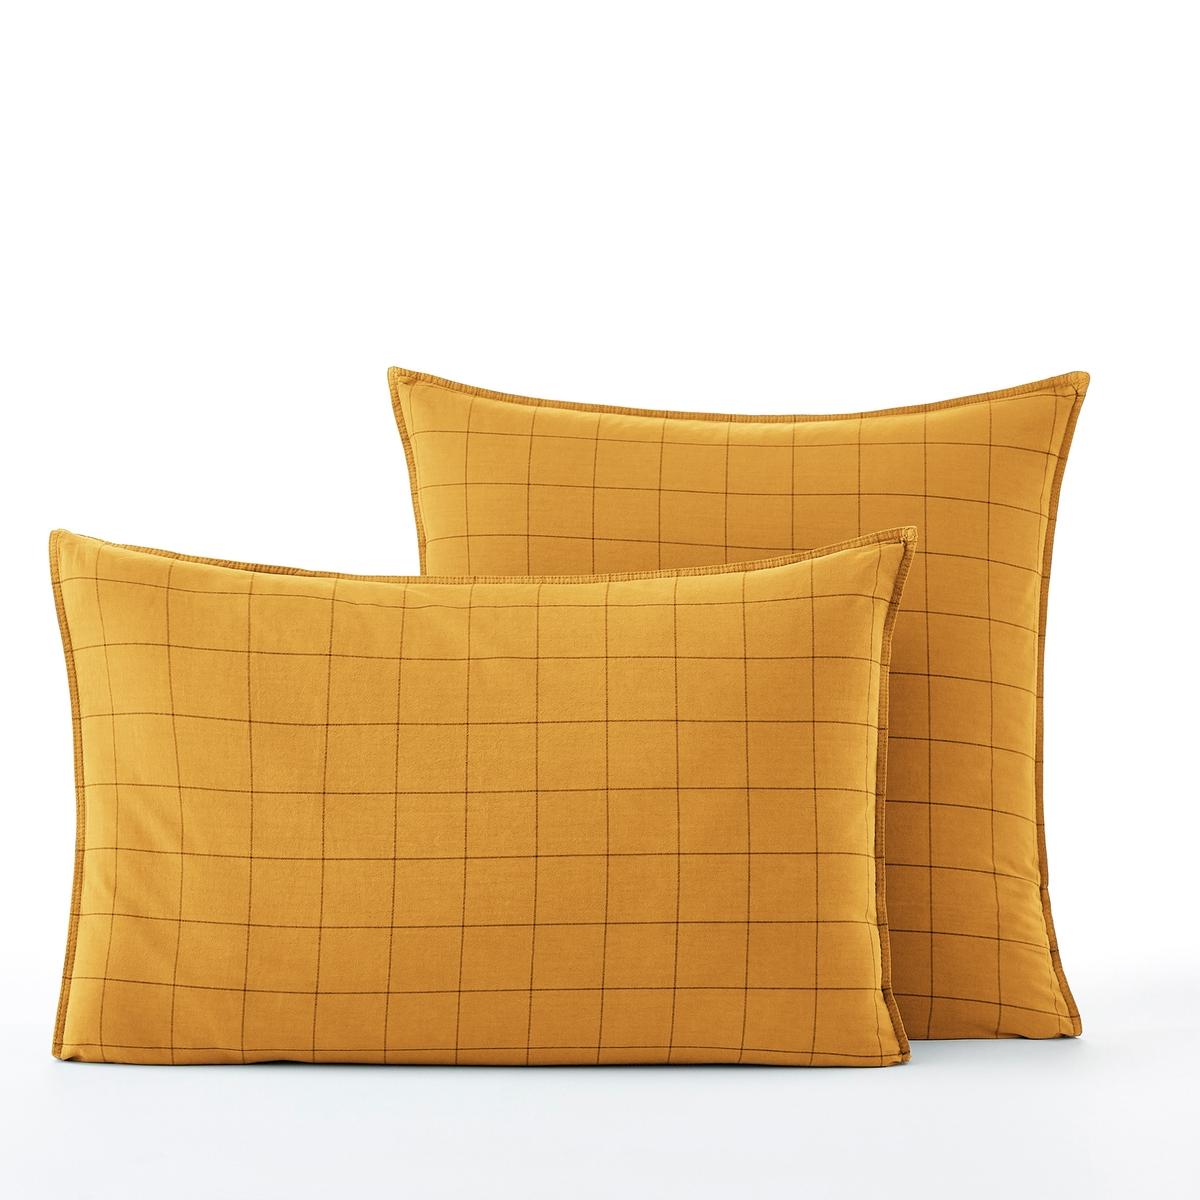 Наволочка La Redoute Из биохлопка Ponlok 50 x 70 см желтый наволочка la redoute из хлопкаton marilou 50 x 70 см синий